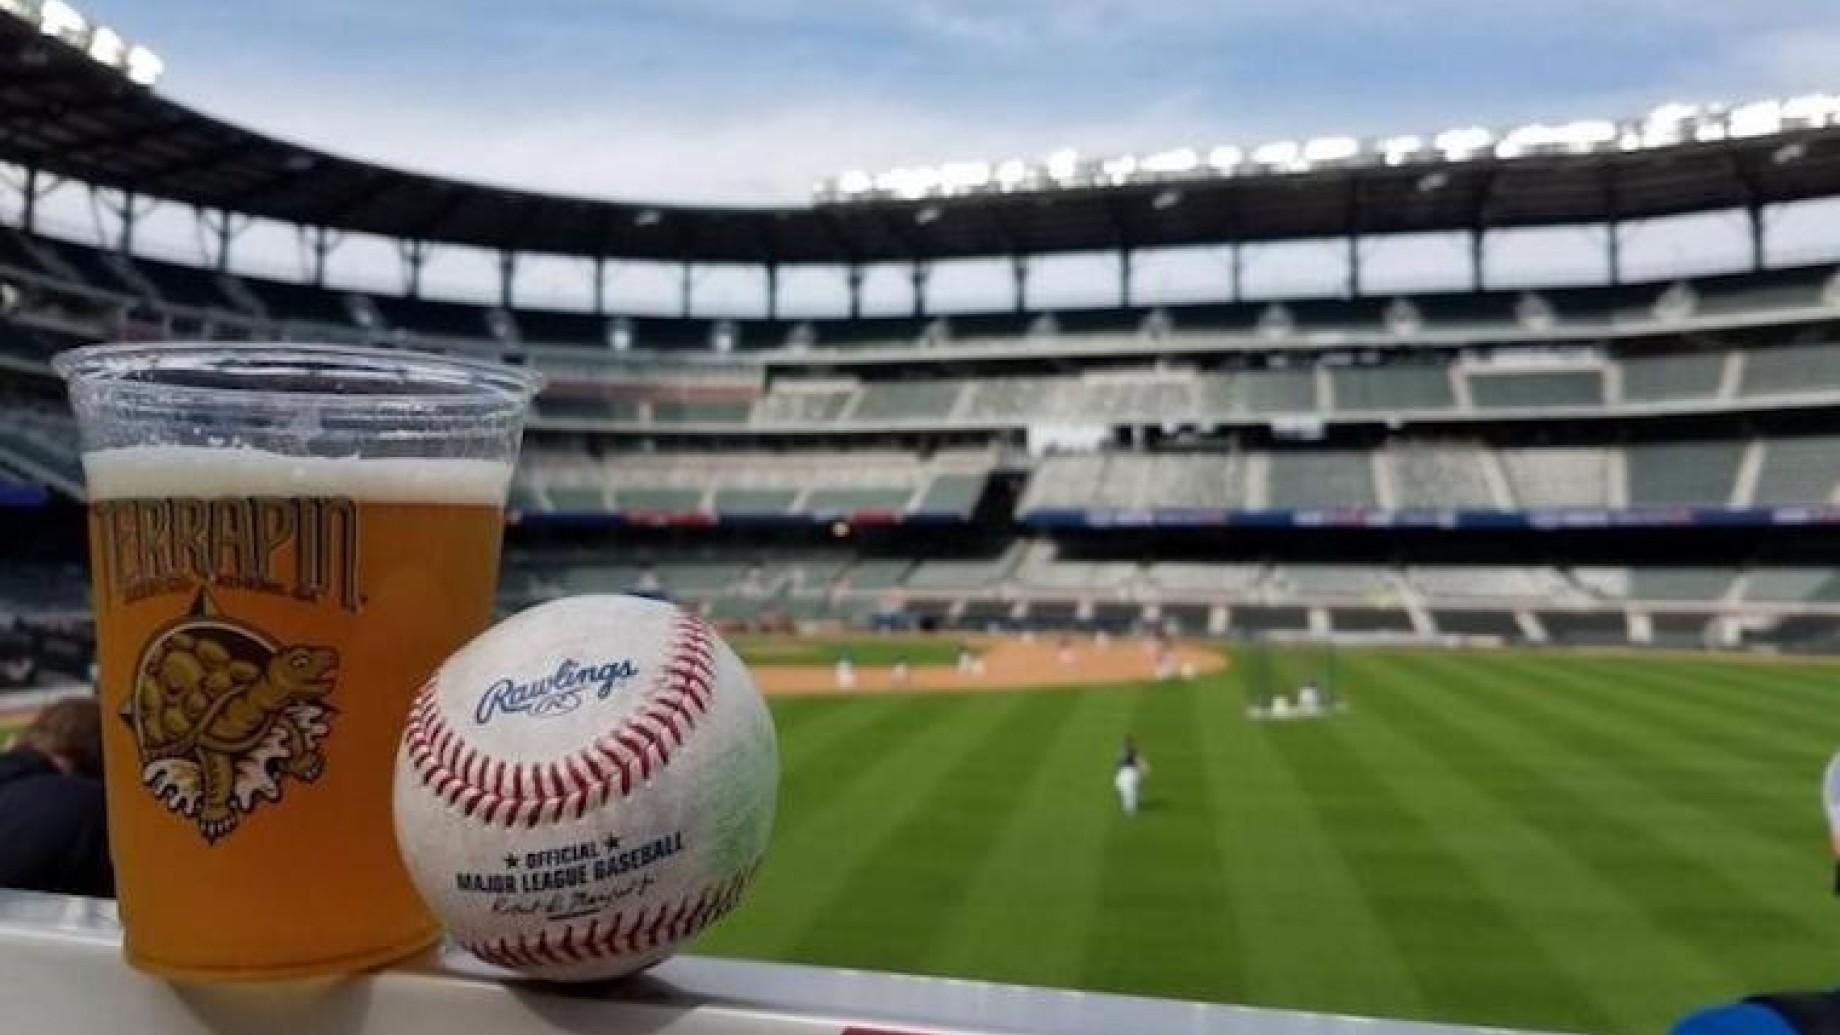 beer-brewed-from-baseball-bats-to-be-served-at-atlanta-braves-stadium